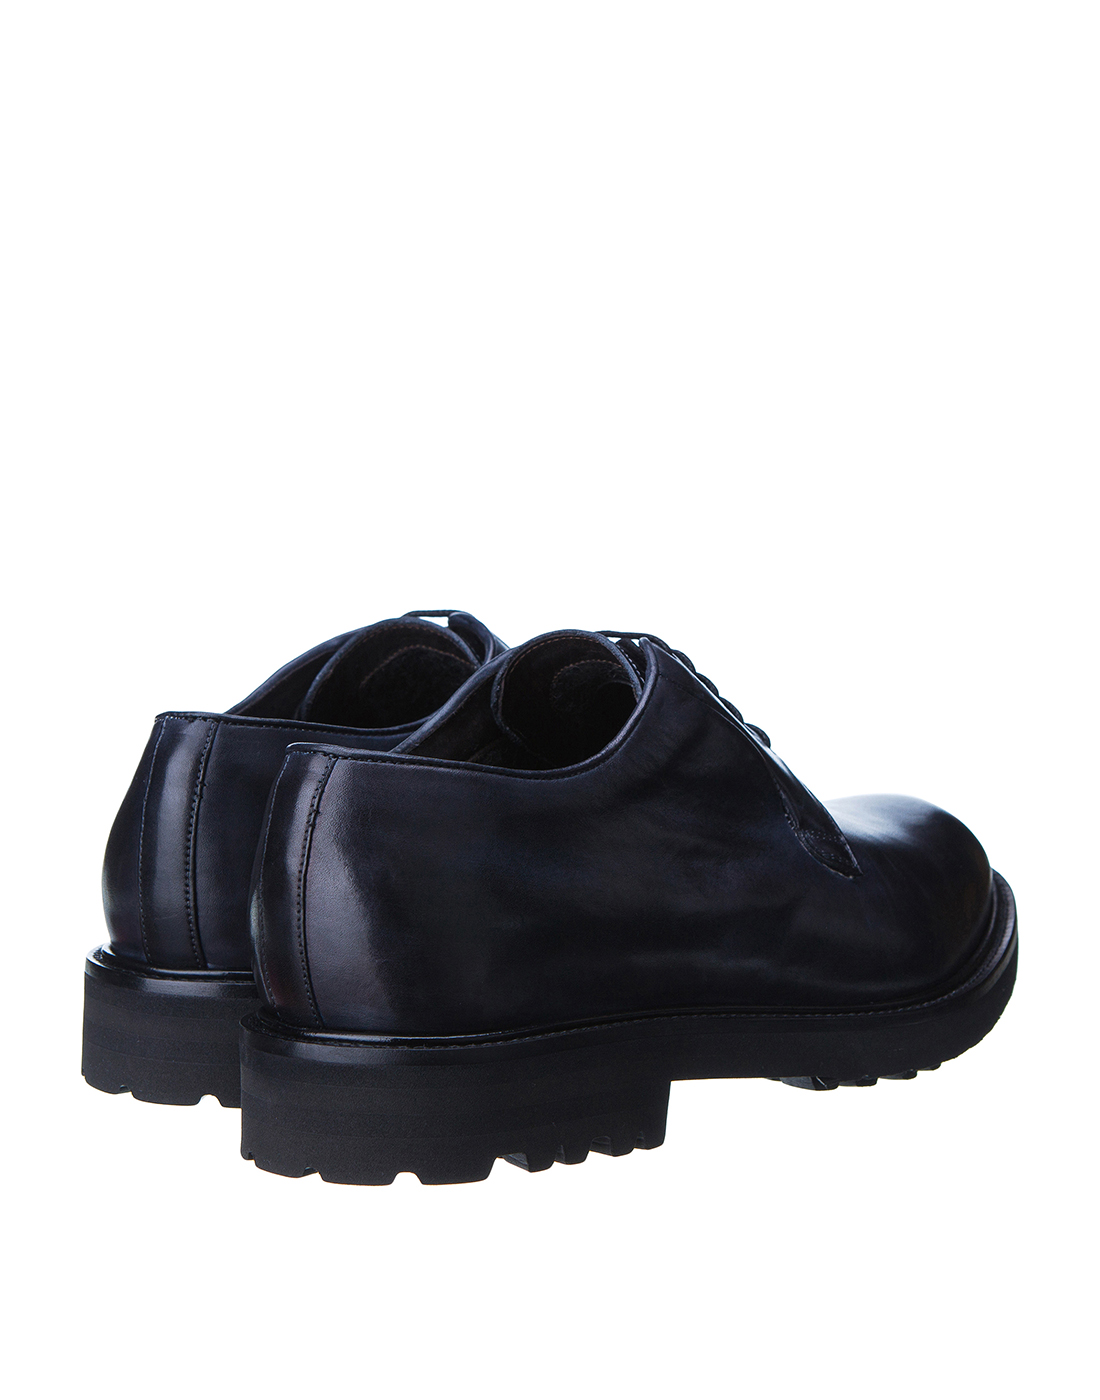 Туфли синие мужские Brecos S8066-3